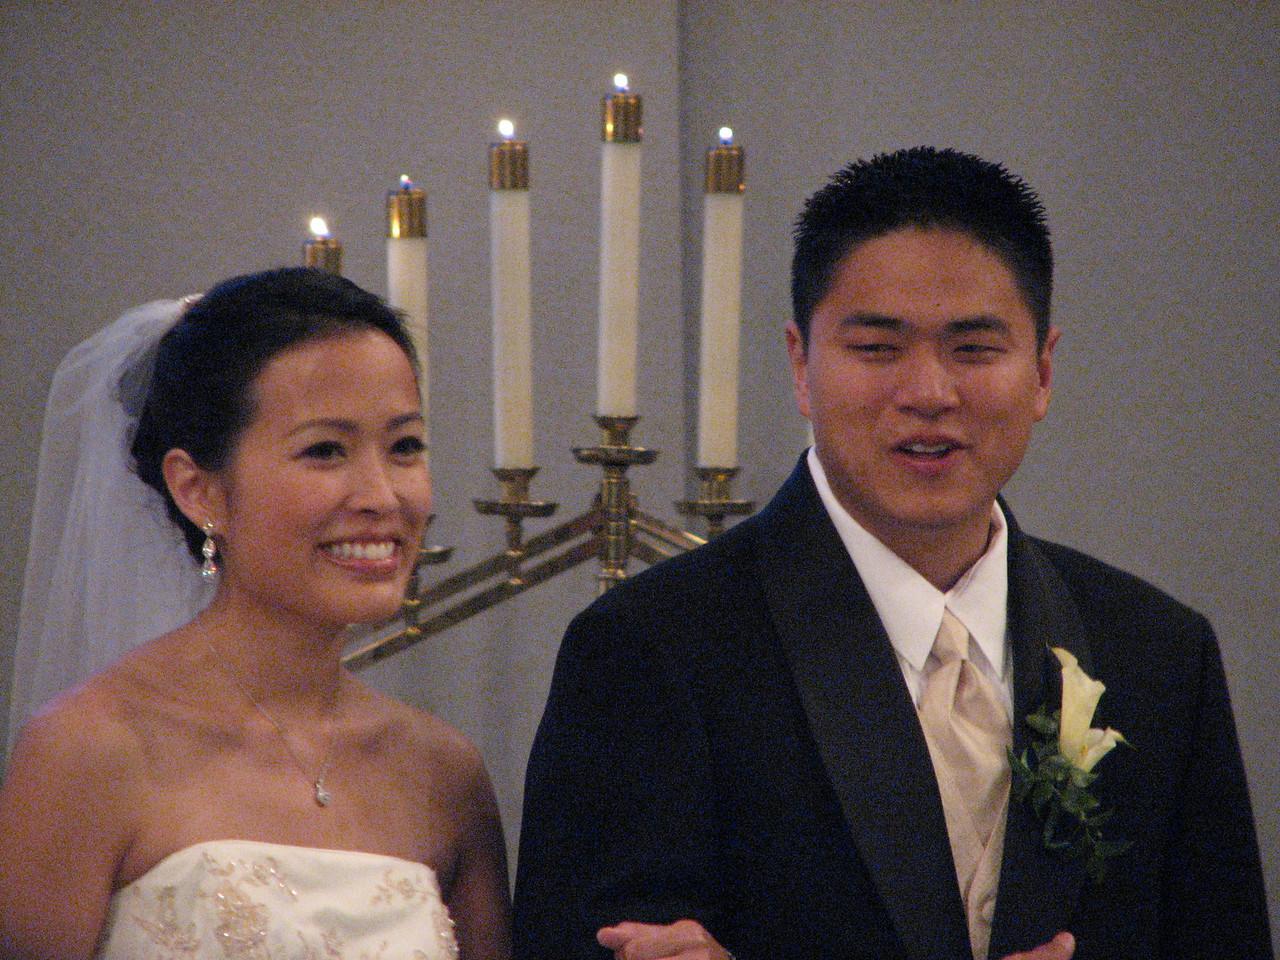 2007 06 09 Sat - The couple